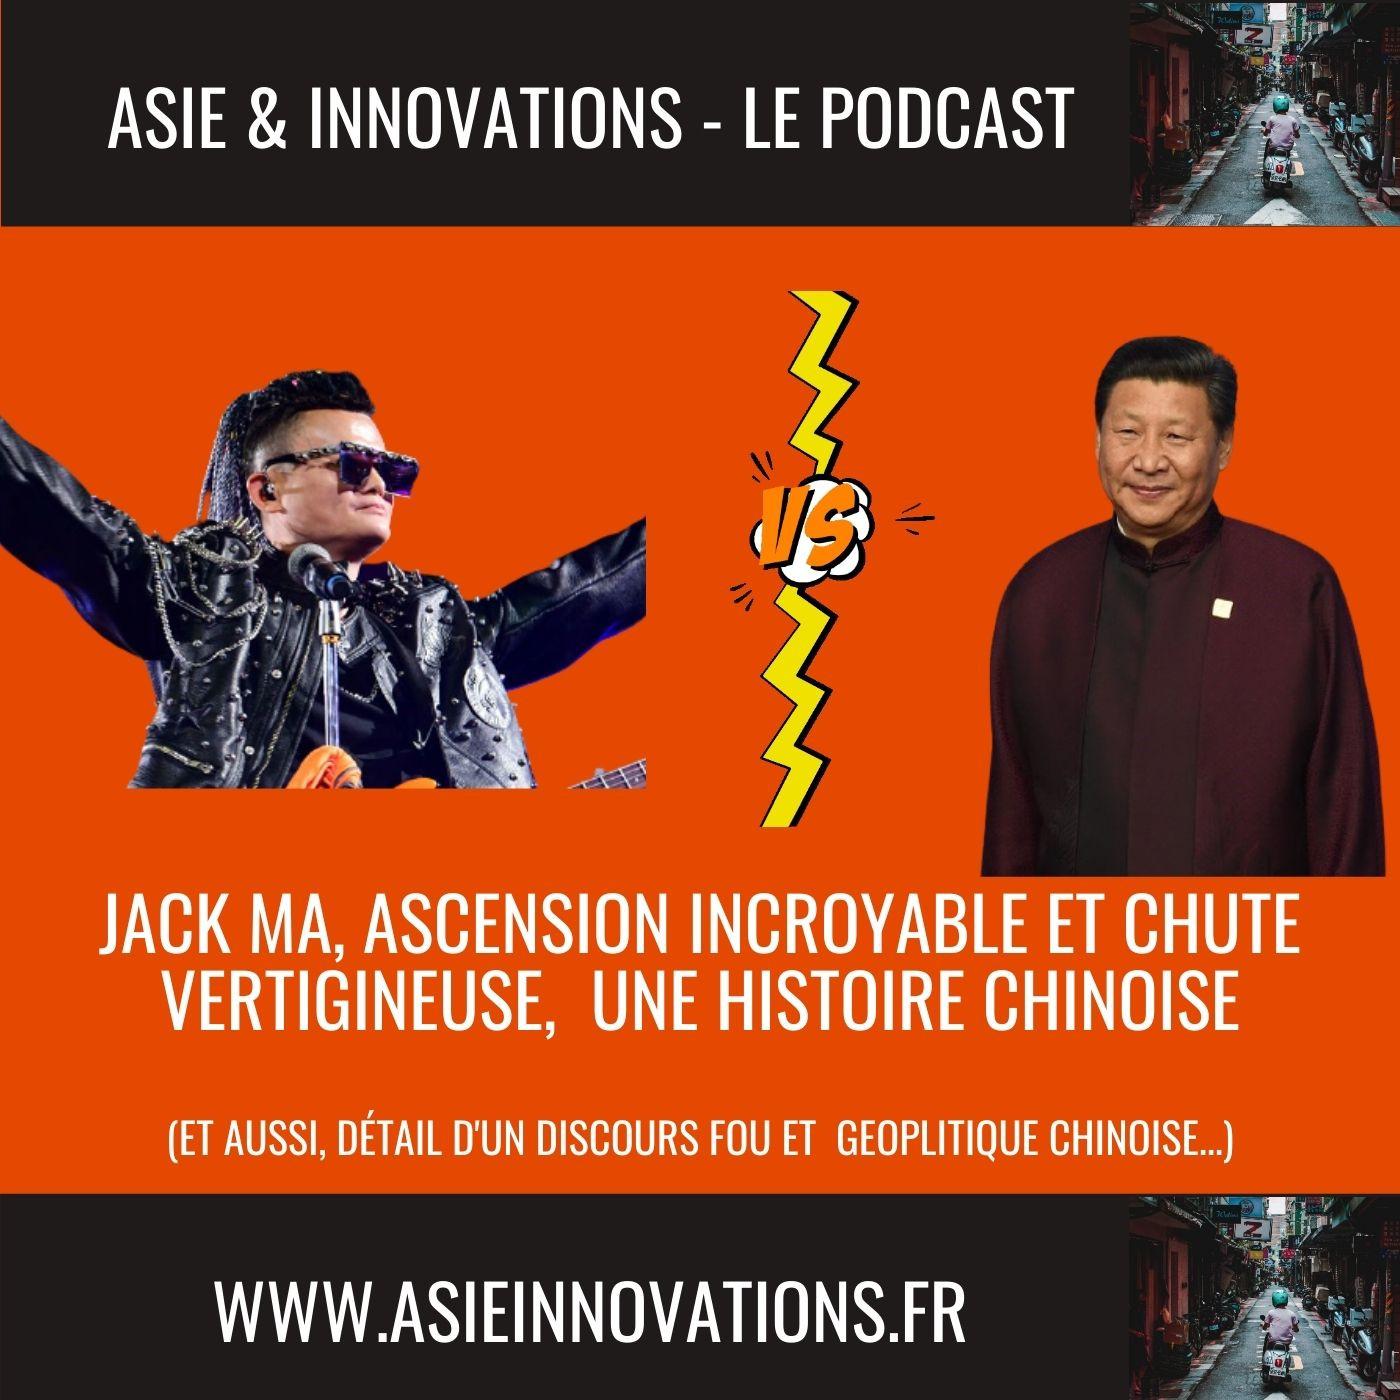 Jack MA, ascension incroyable et chute vertigineuse, une histoire chinoise